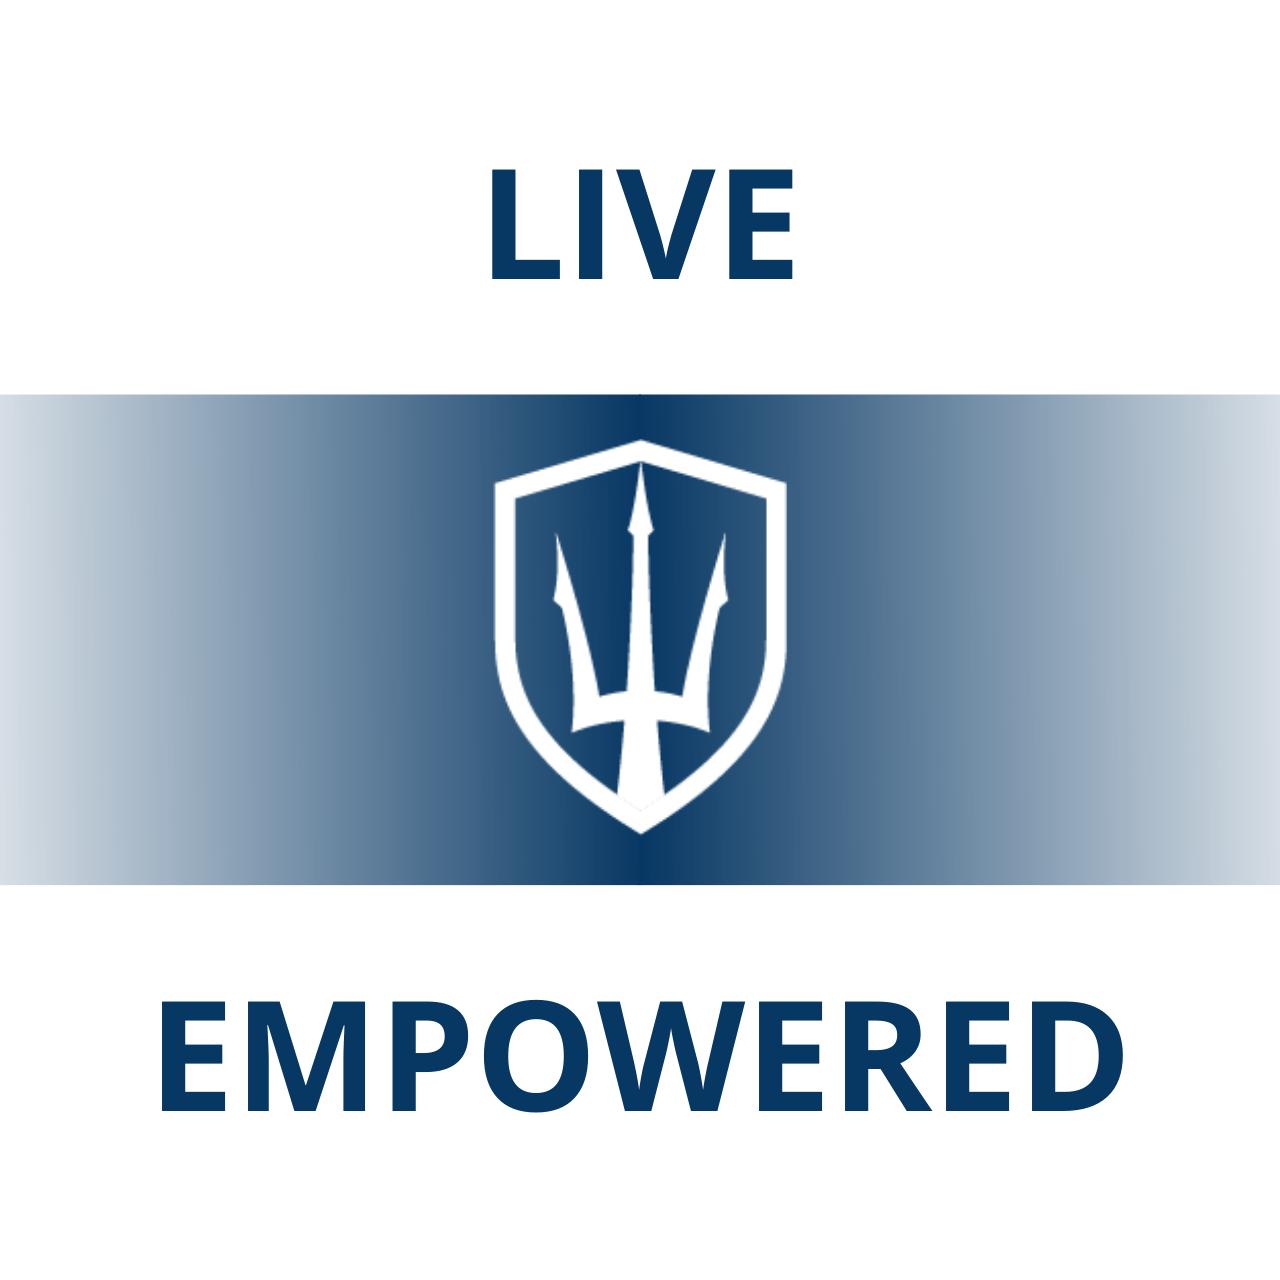 Live Empowered (5)